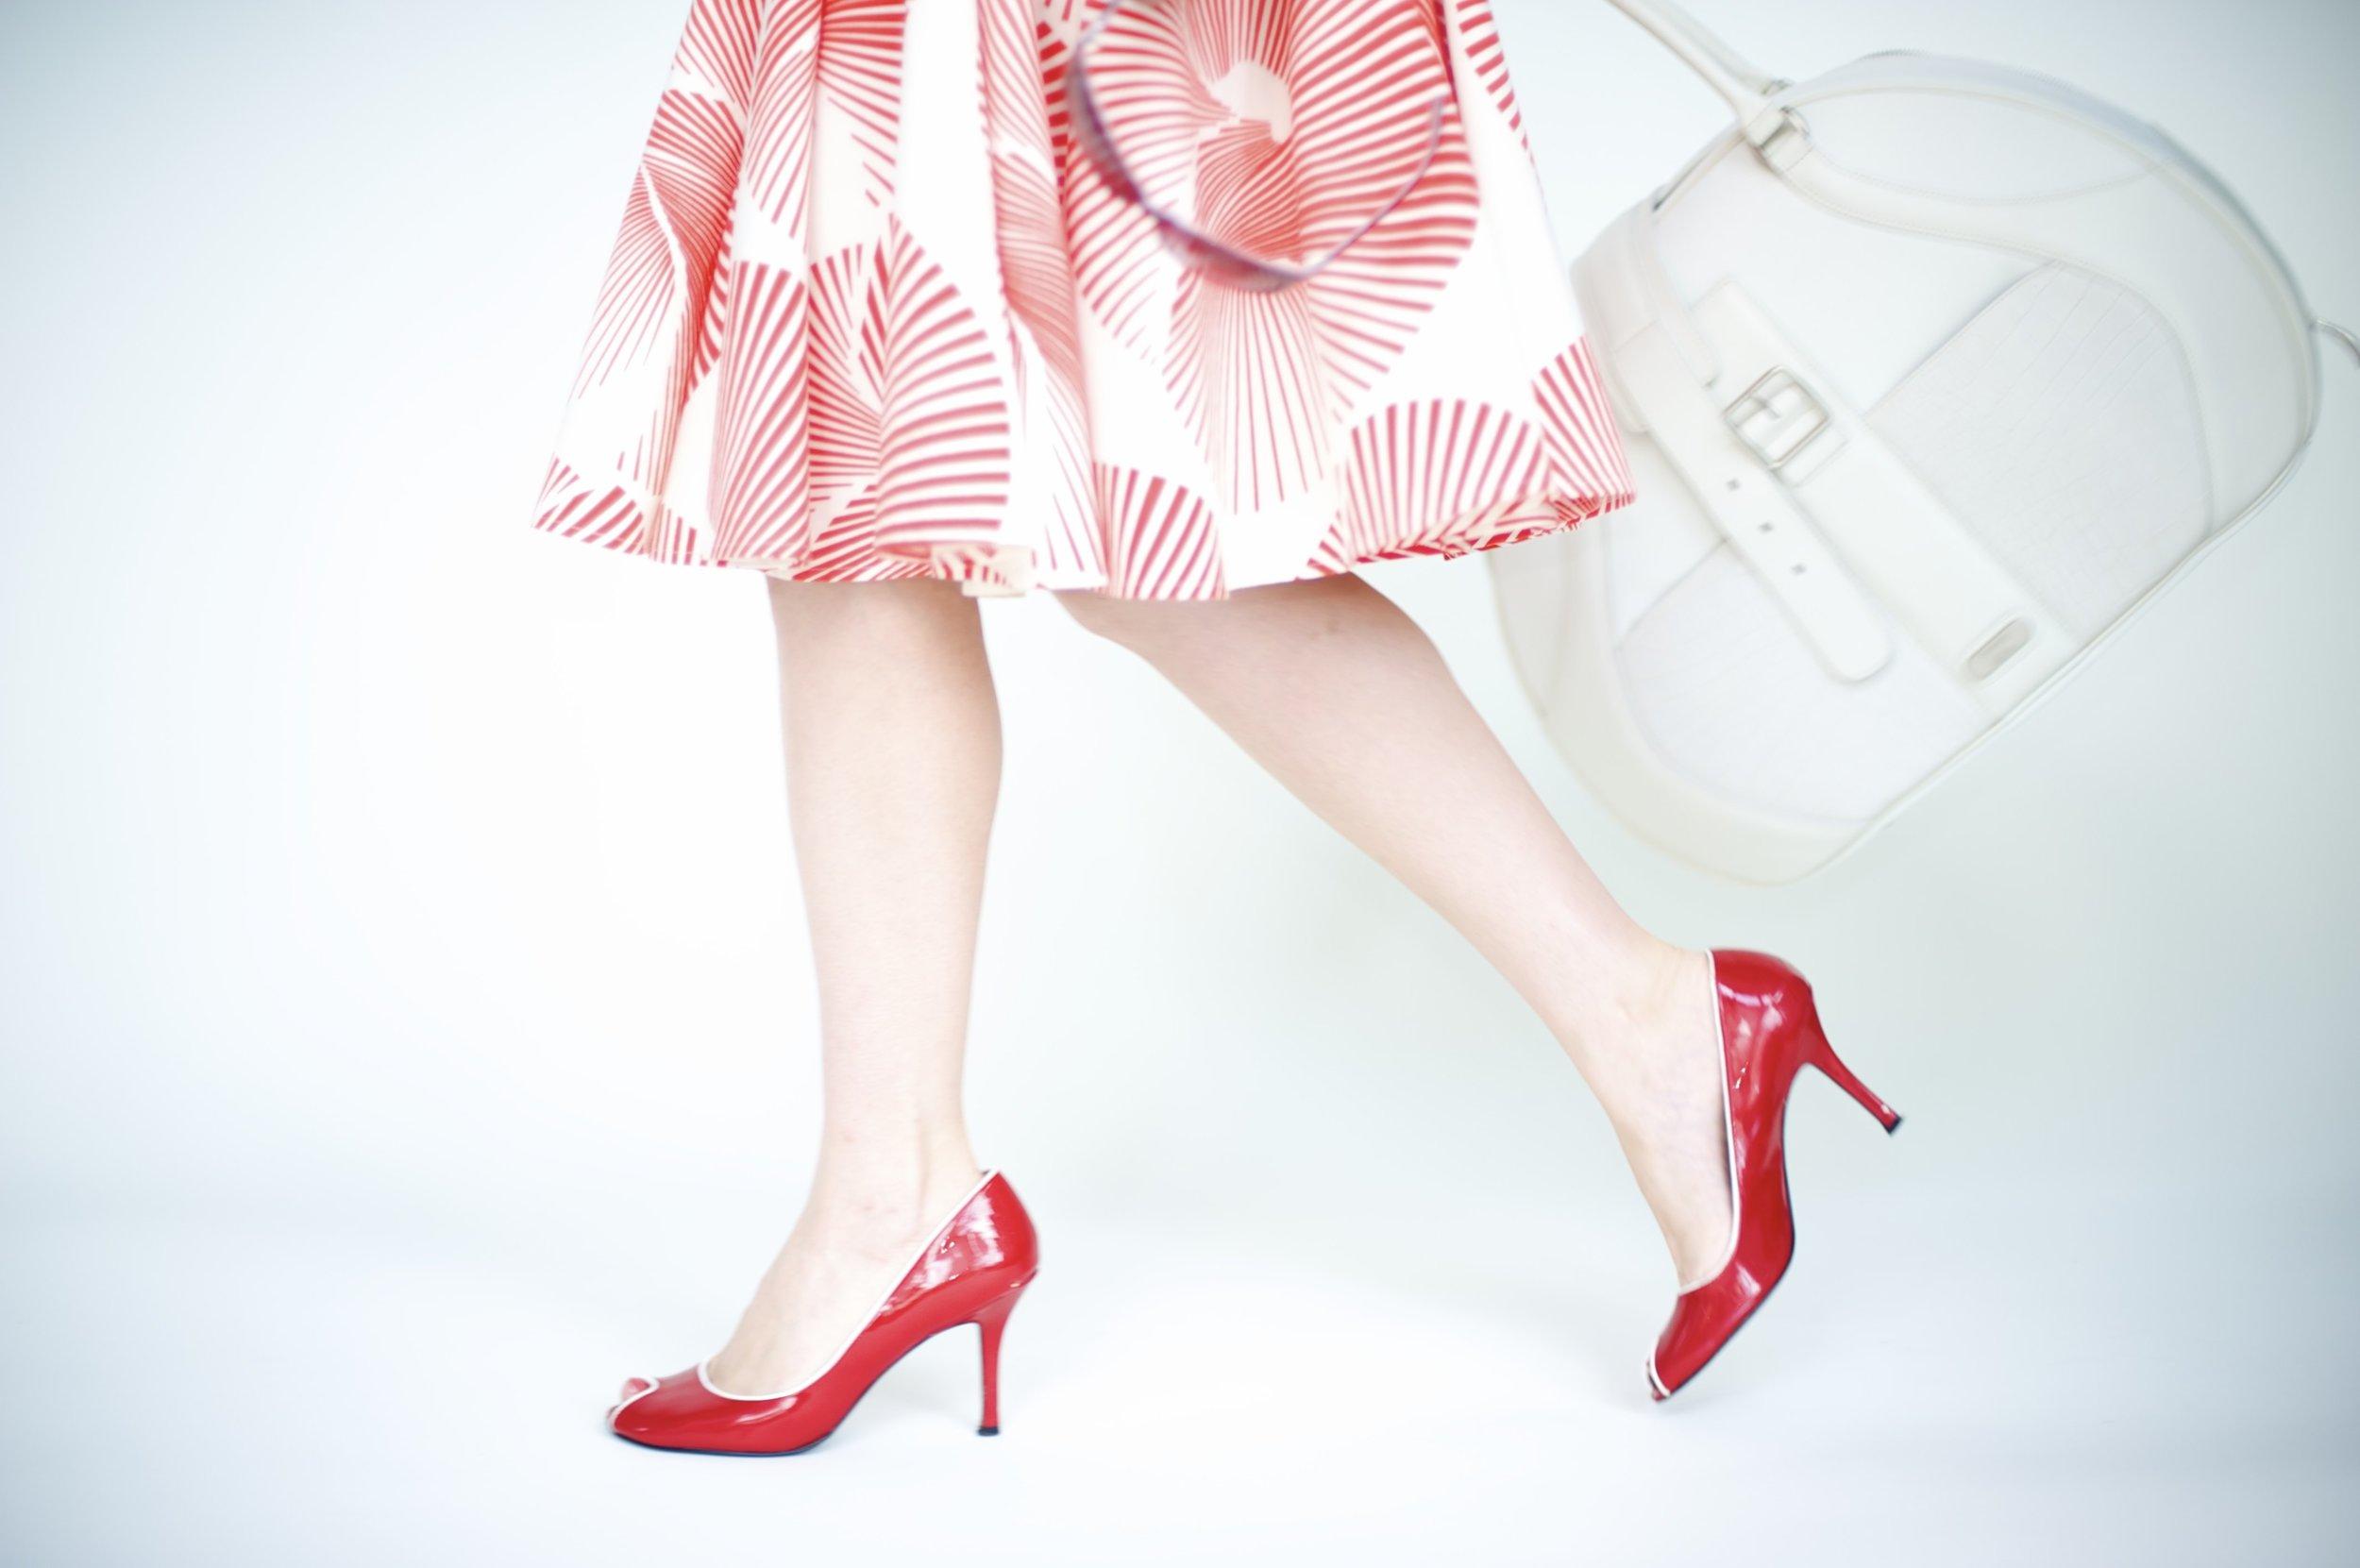 red heels white bag walking.jpg